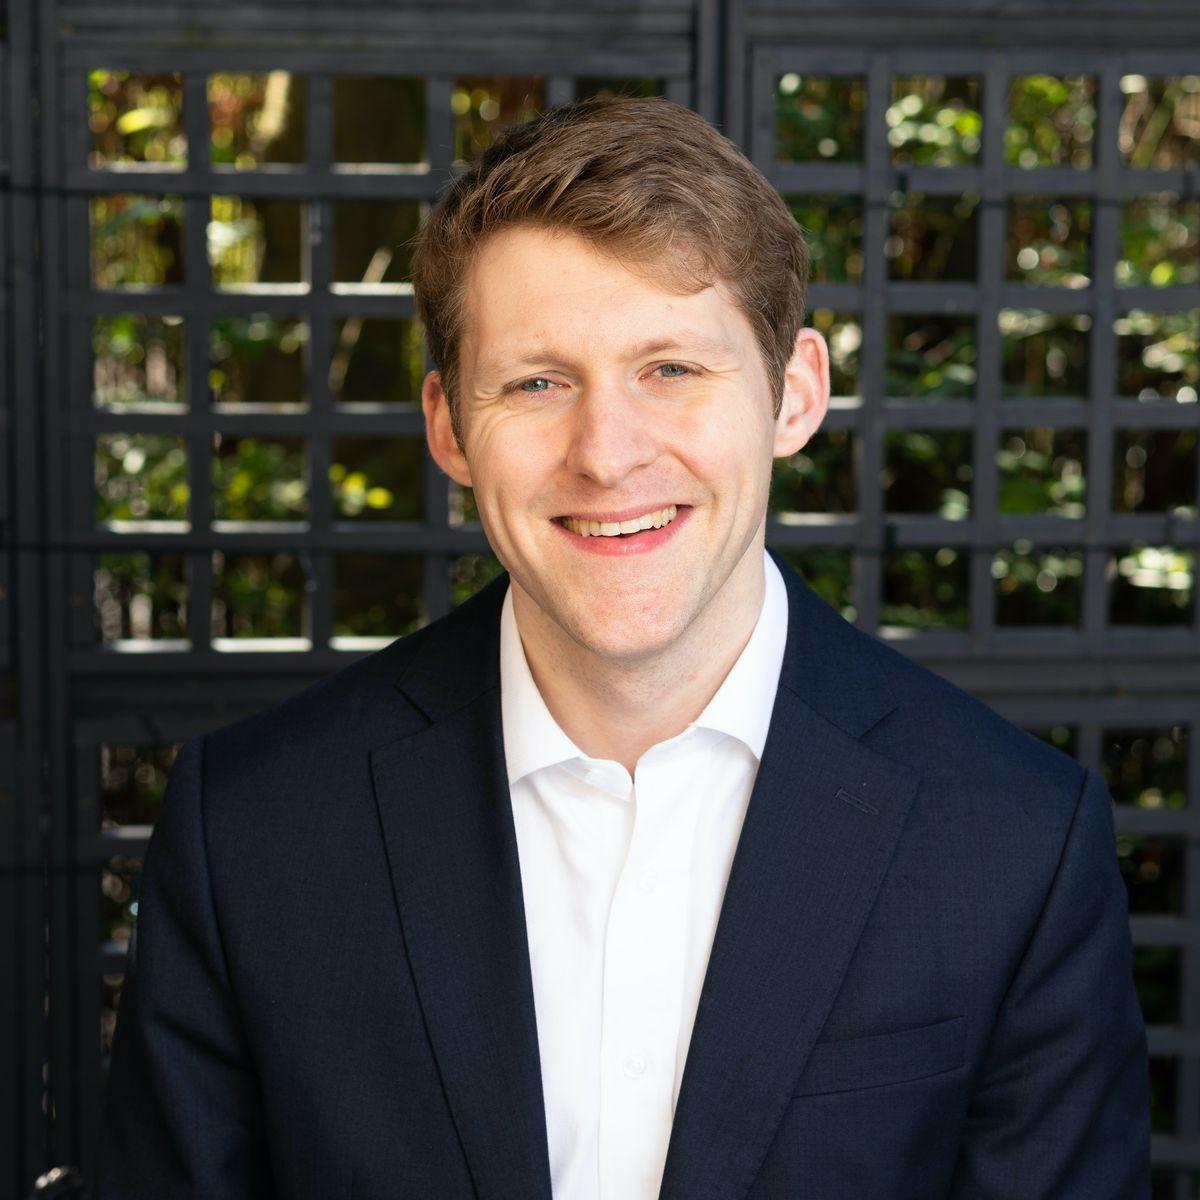 Entrepreneur Theo Millward